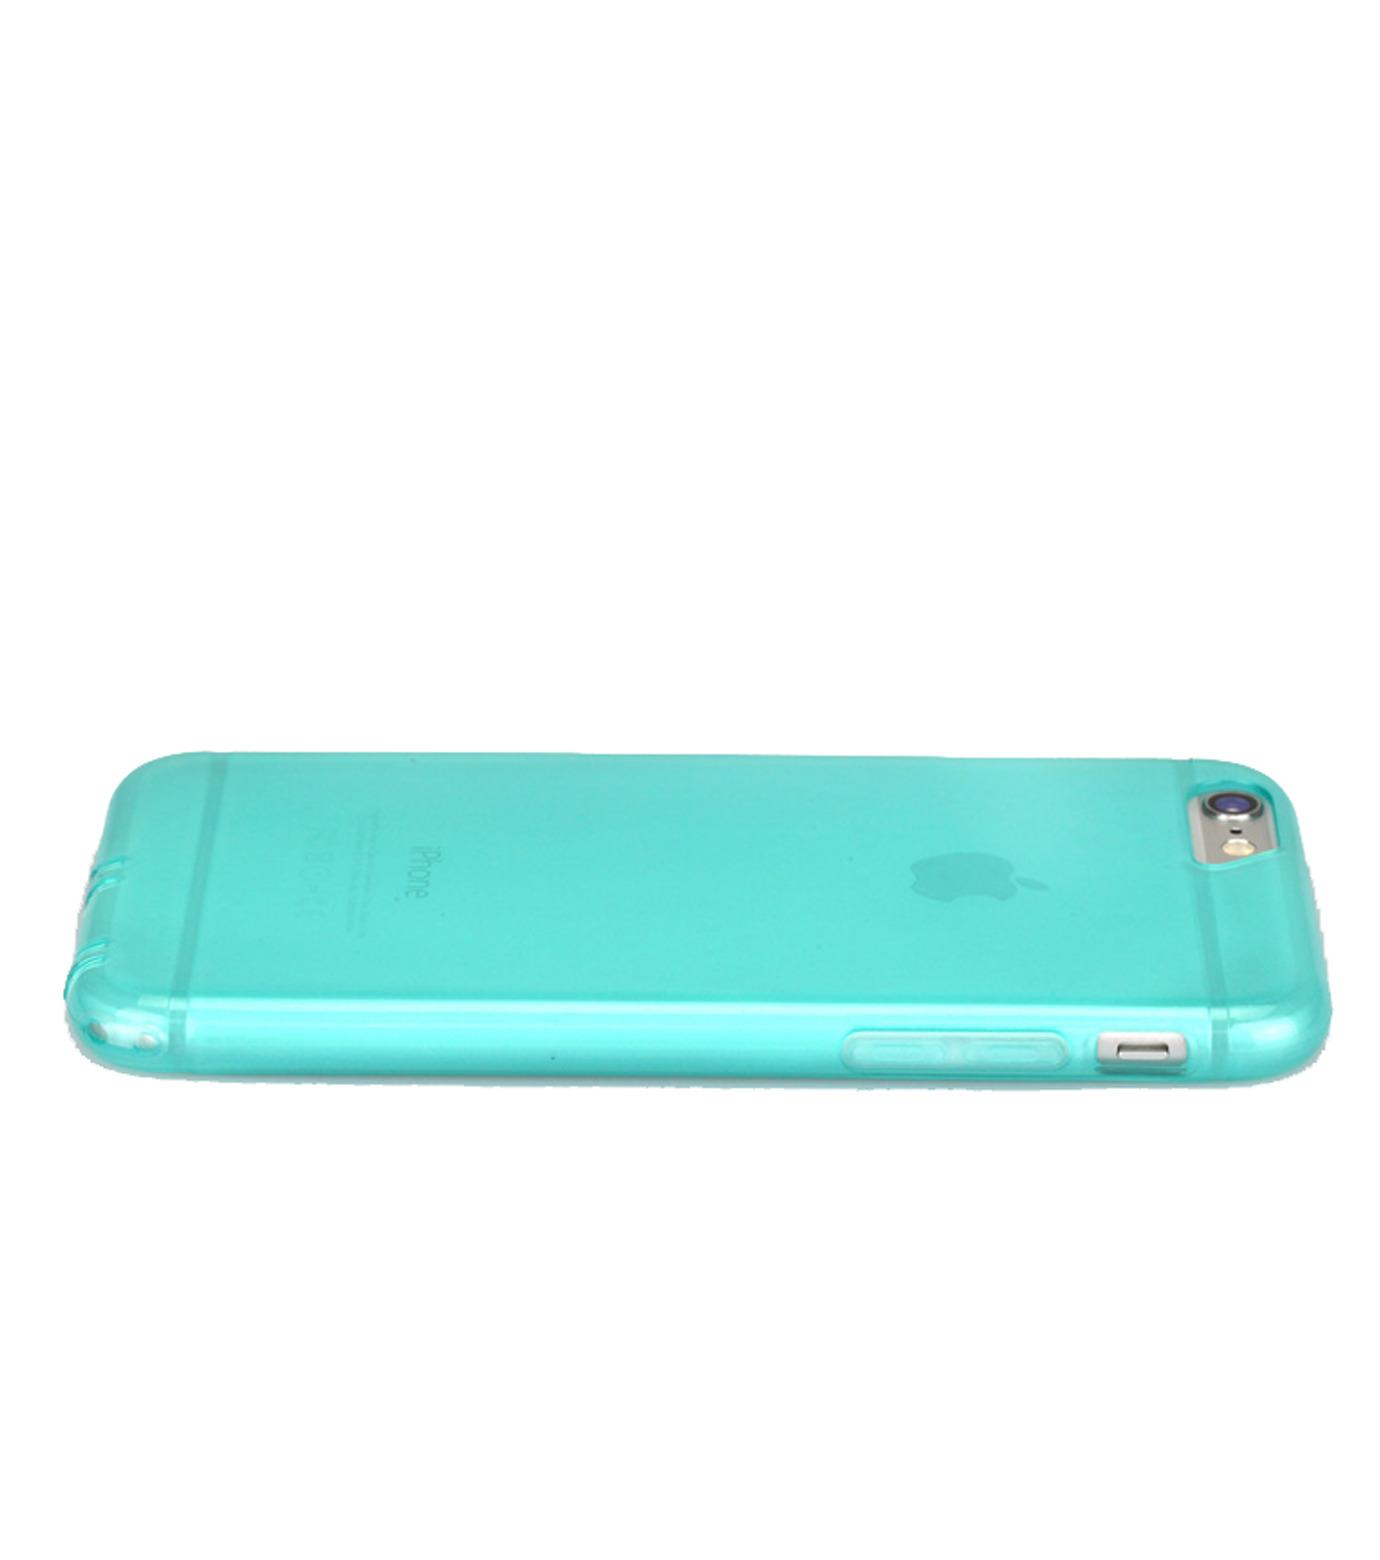 Tunewear(チューンウエア)のsoftshell 6/6s-NONE(ケースiphone6/6s/case iphone6/6s)-TUN-PH-0398-0 拡大詳細画像2